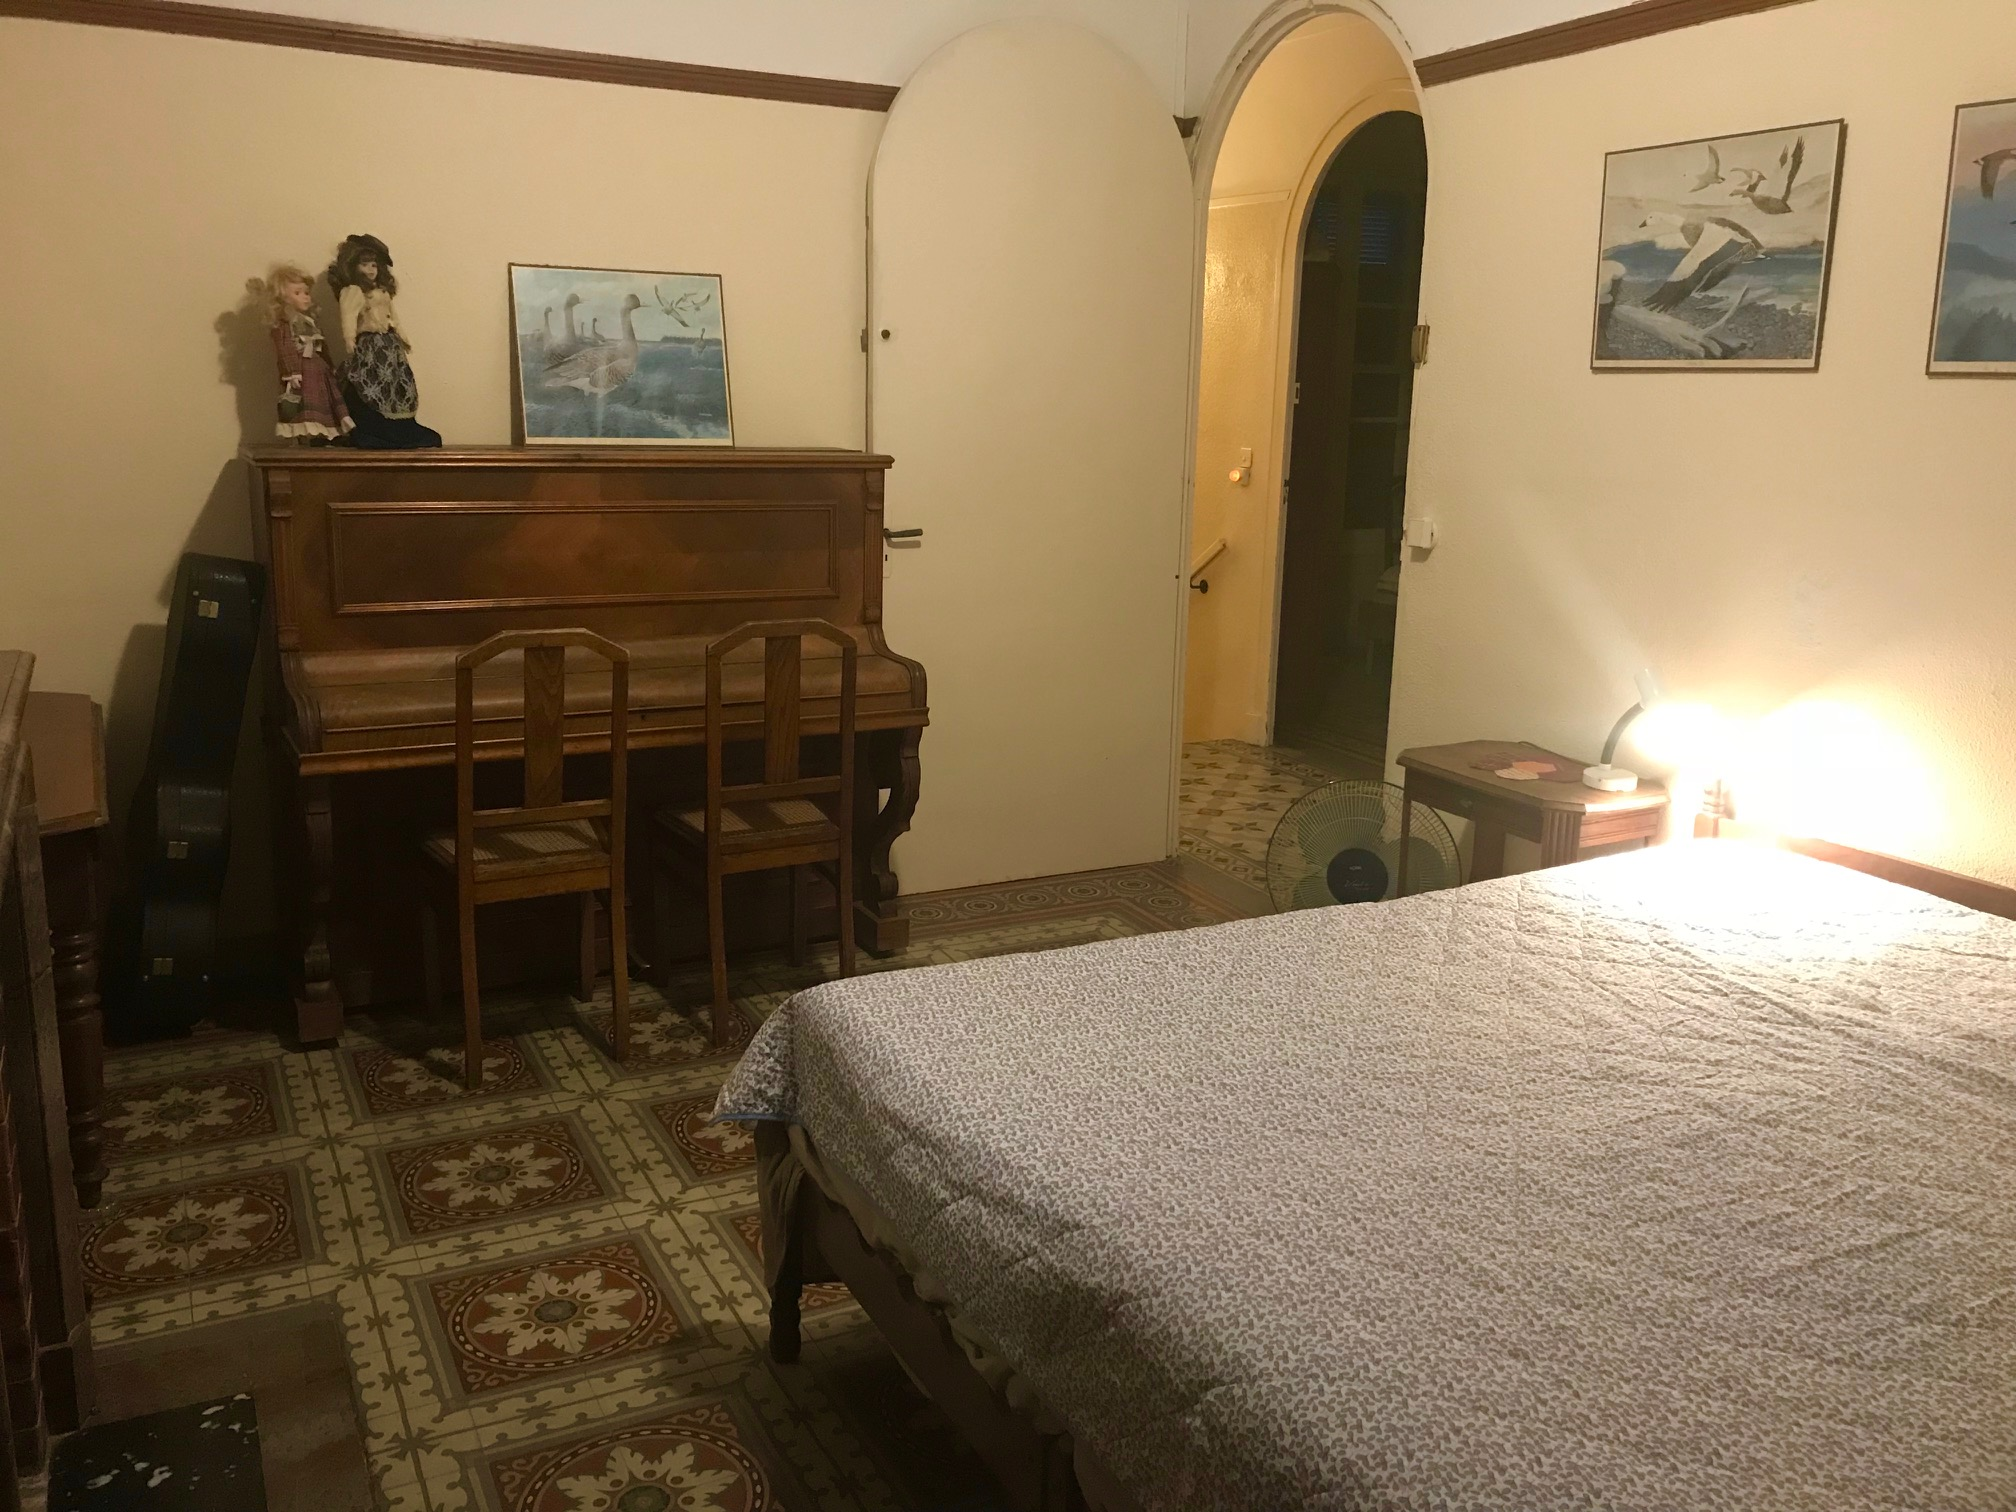 Vakantiehuis huren Zuid-Frankrijk, Cote d'Azur te huur, Bormes les Mimosas, Le Lavandou